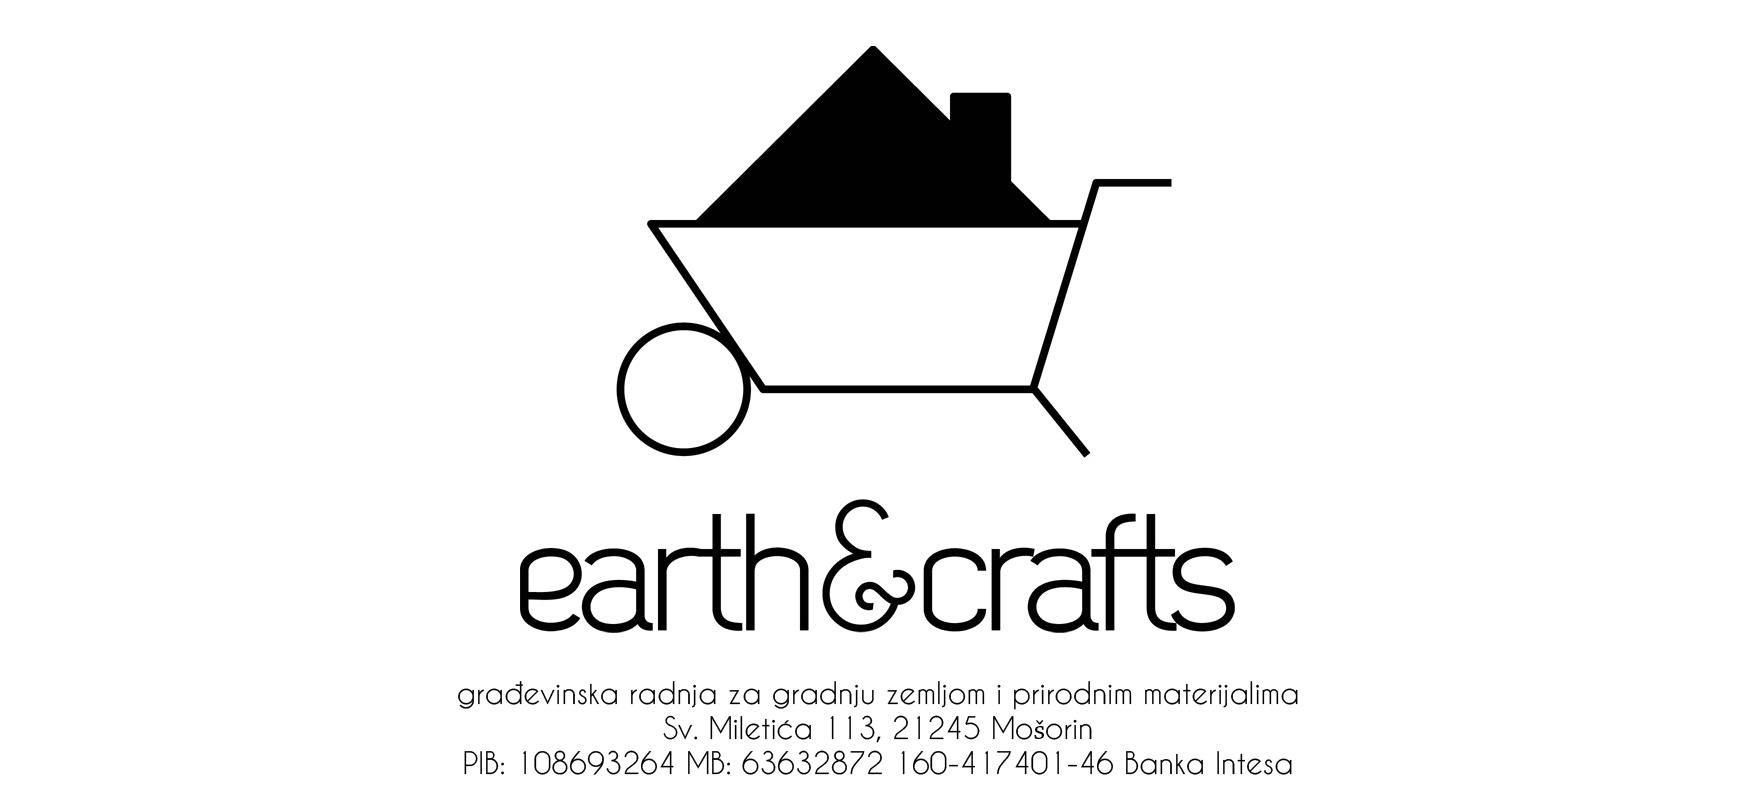 logo i podaci